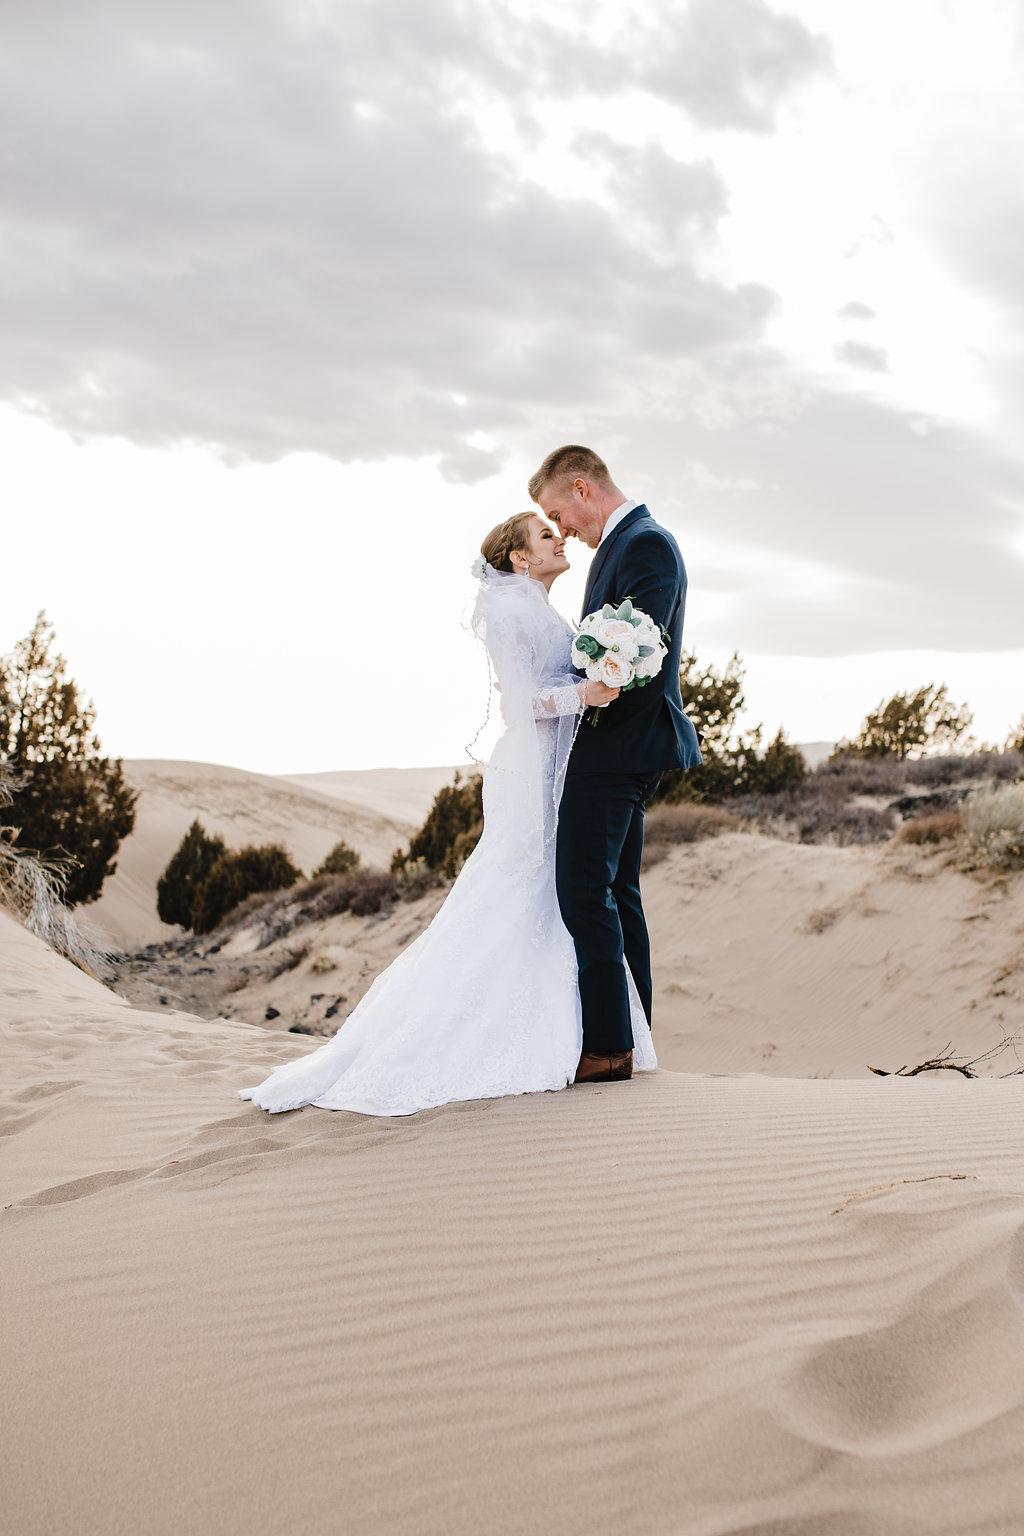 rexburg idaho adventurous wedding photographer bridals and formals sand dunes calli richards photographer